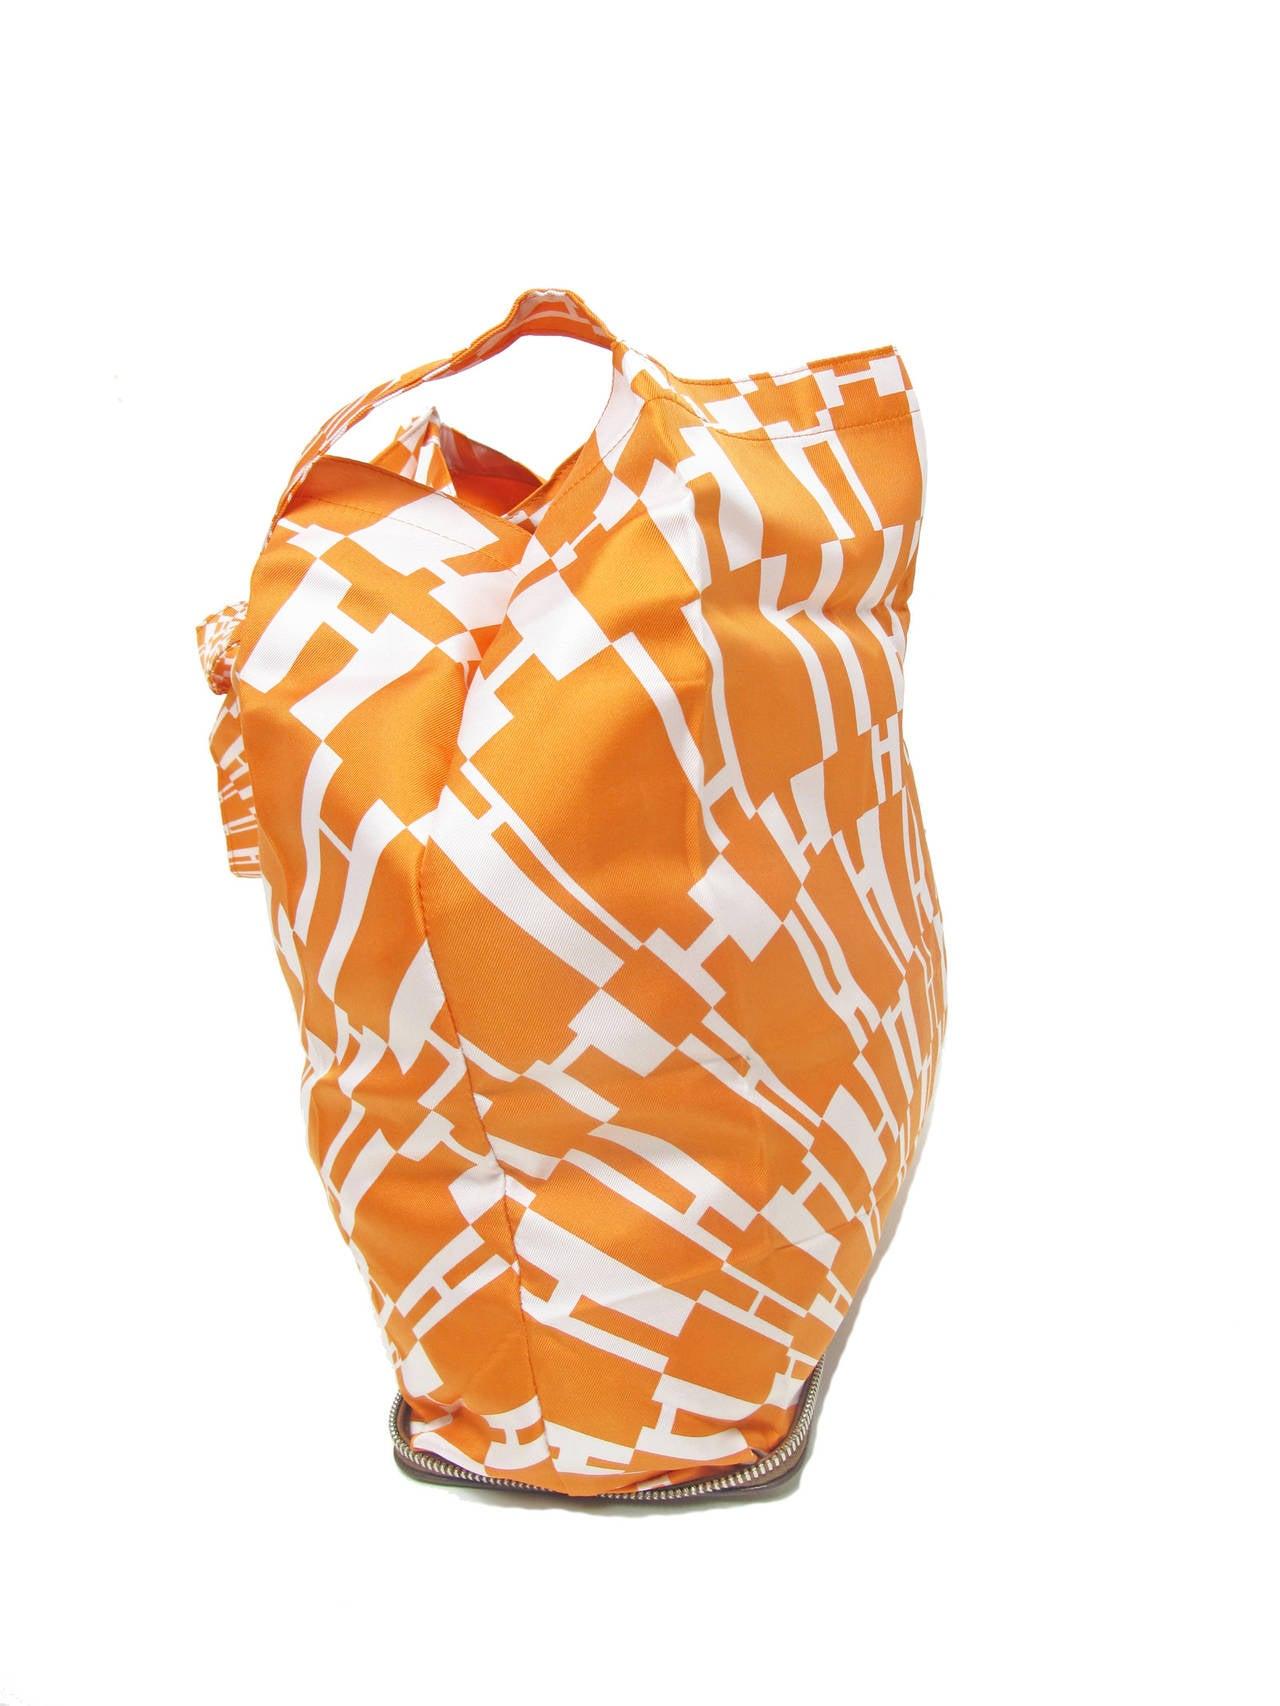 Rare Hermes Orange H Shopper Tote Collapsible Zip Handbag - sale 5